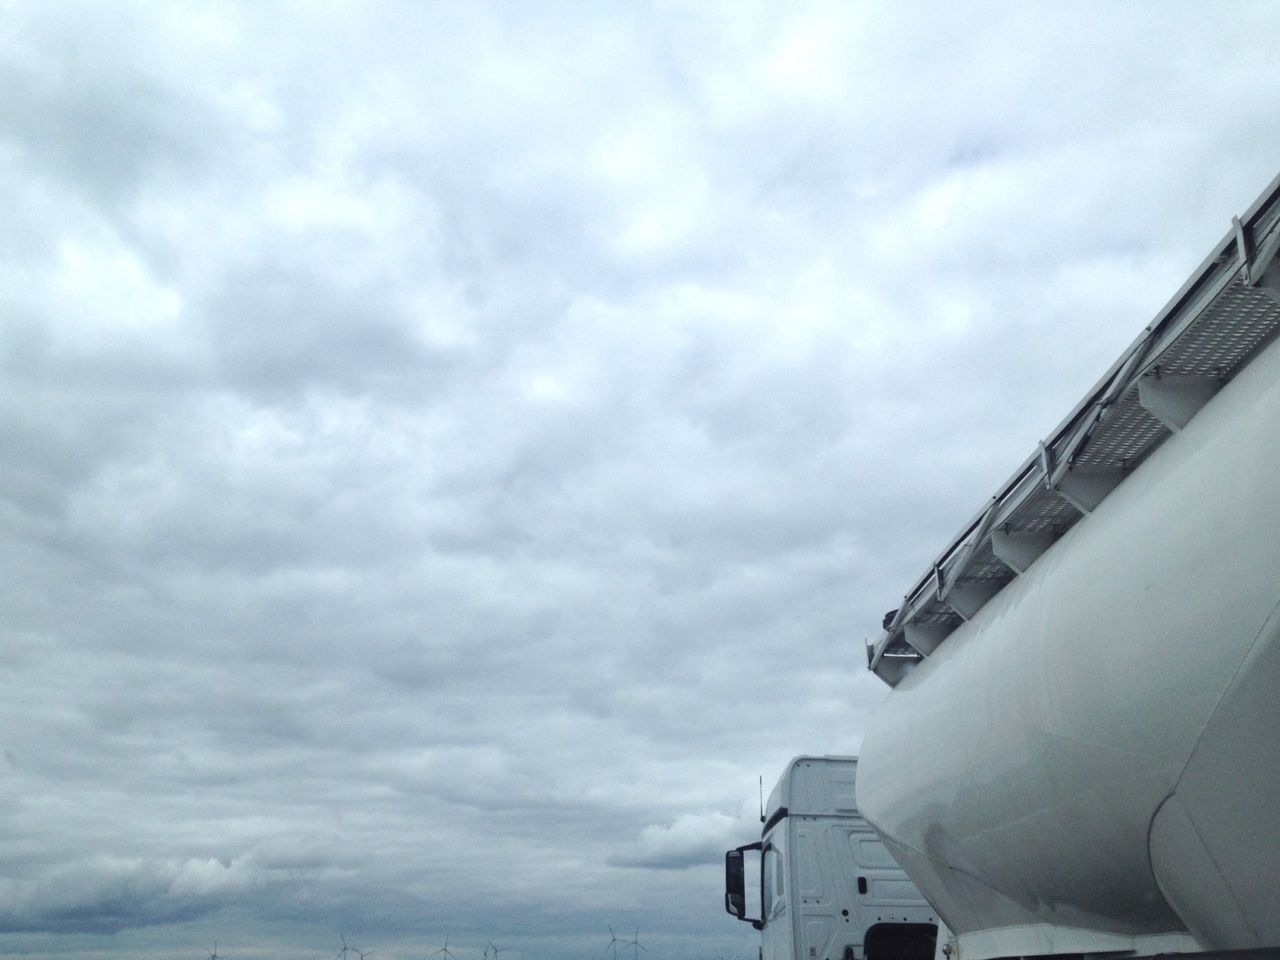 Truck Against Cloudy Sky